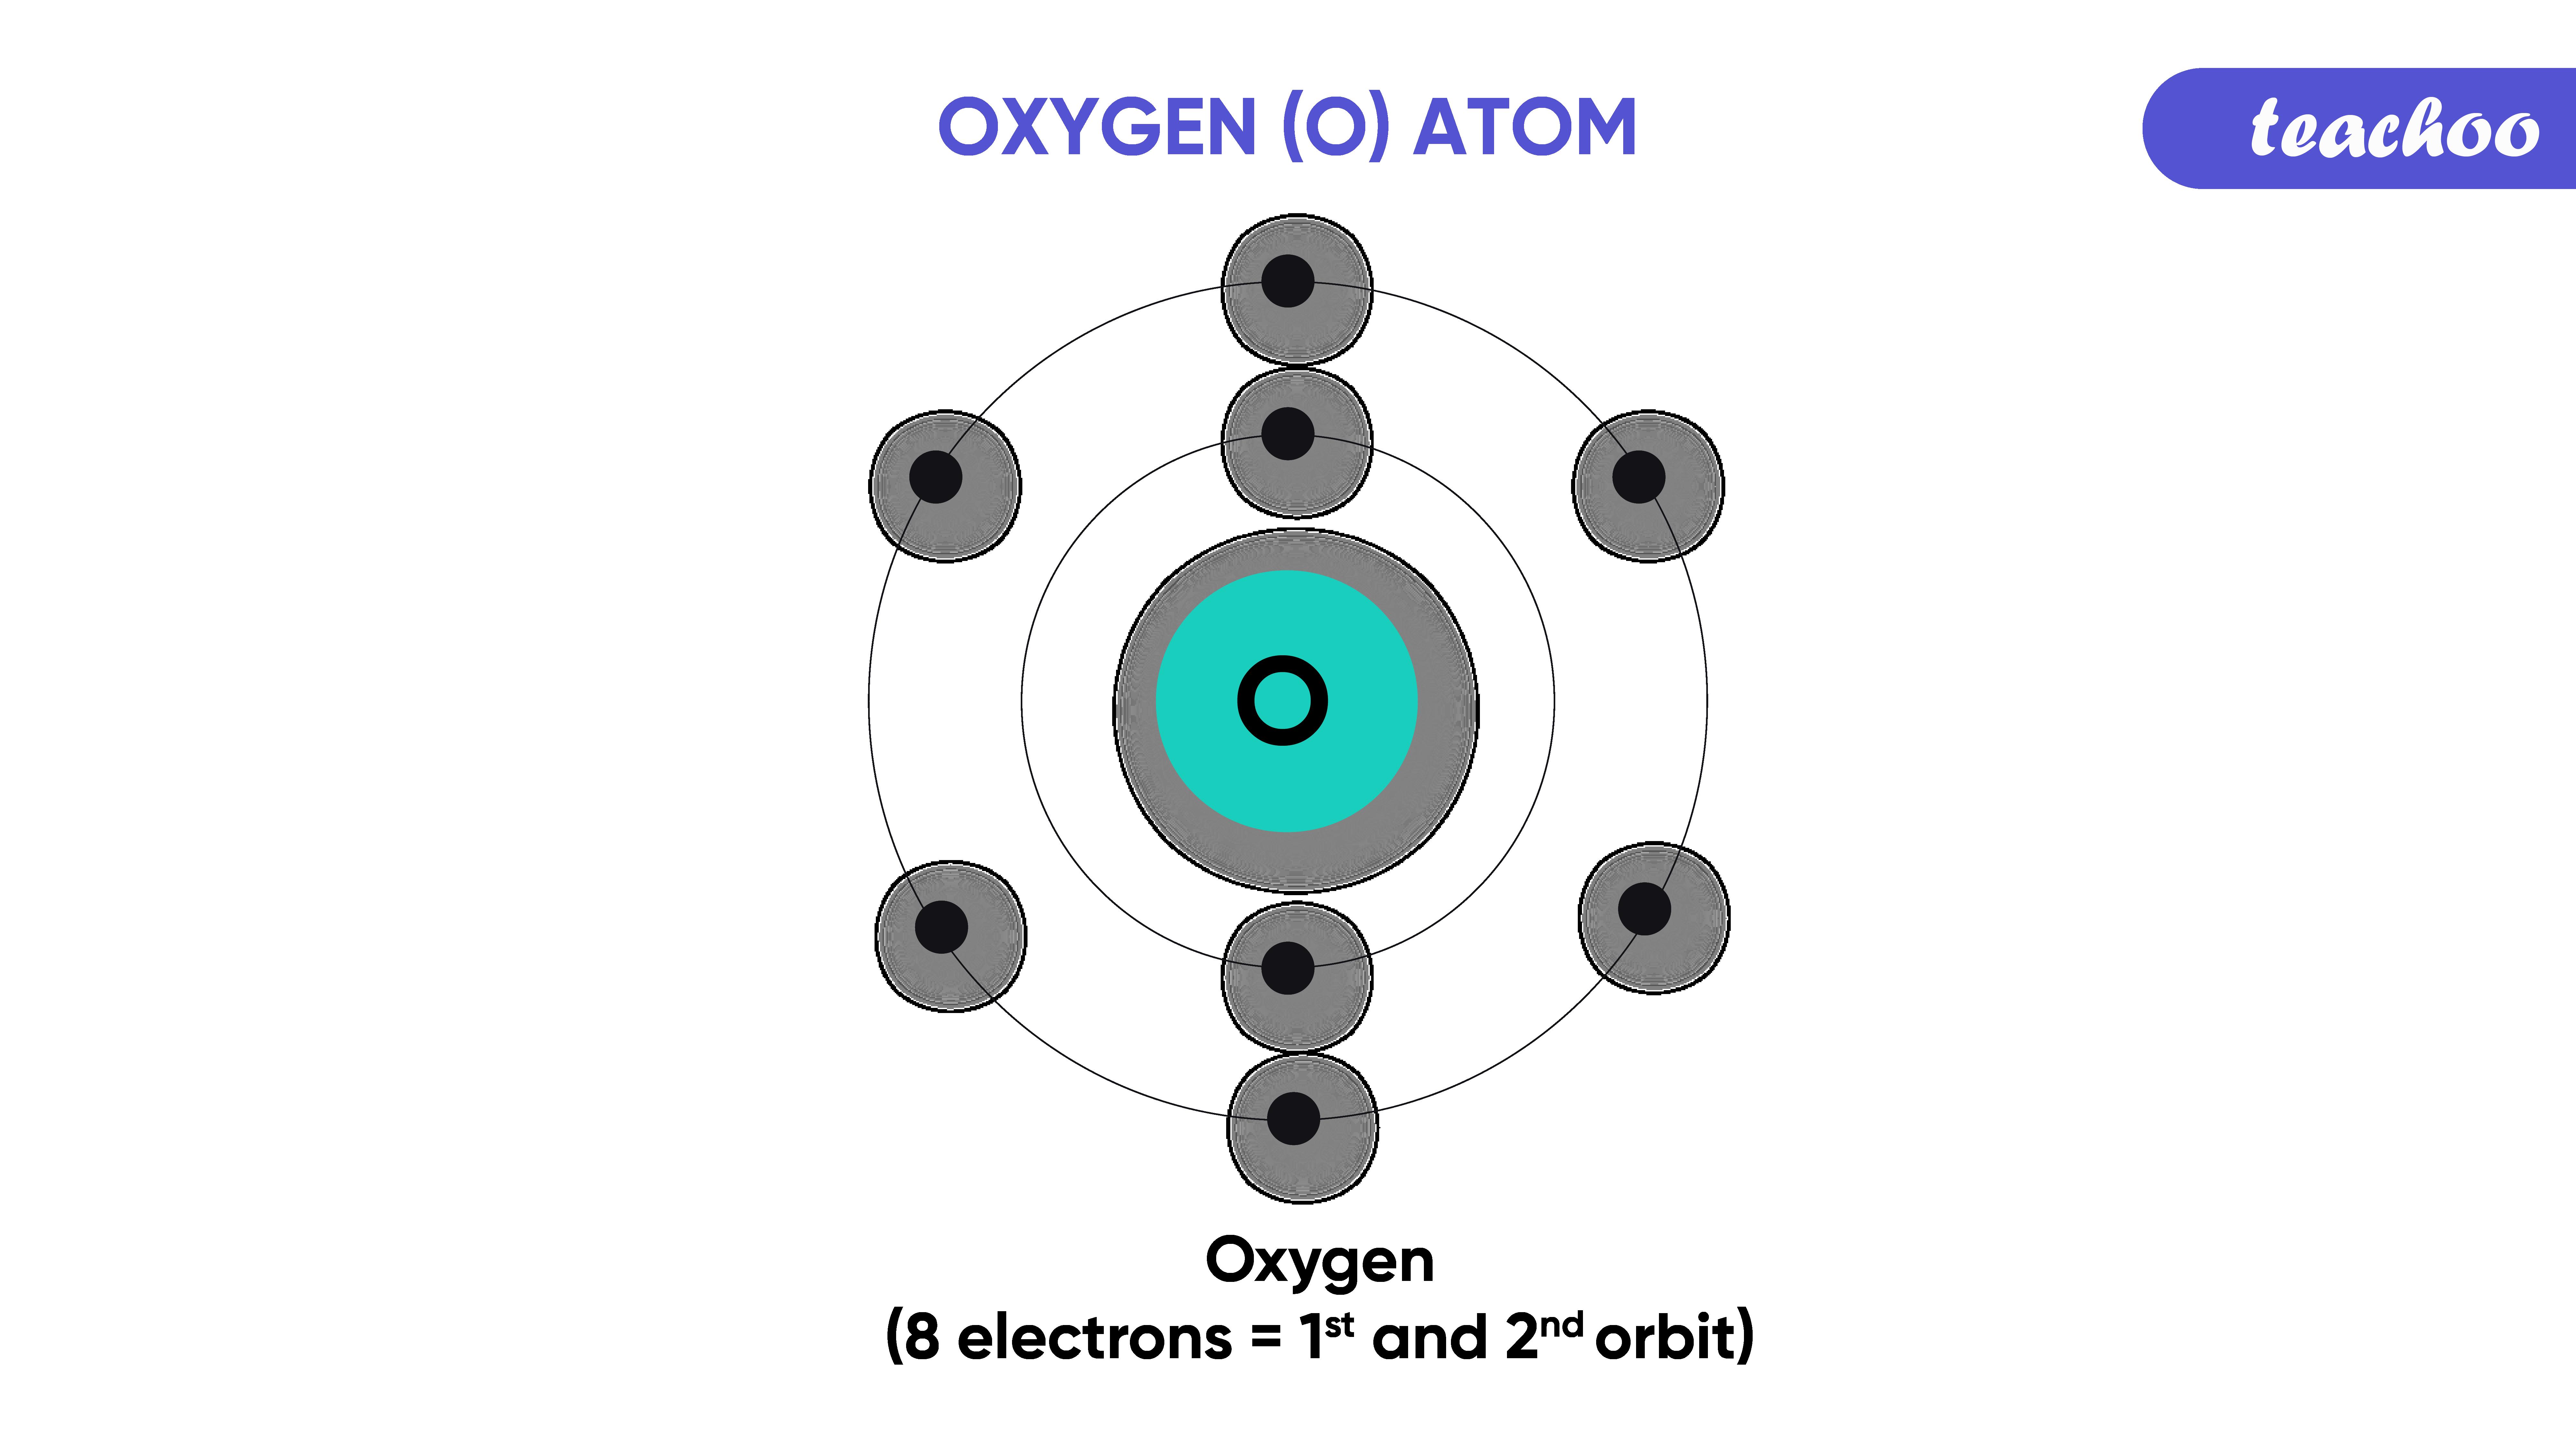 26. oxygen-Teachoo-01.png